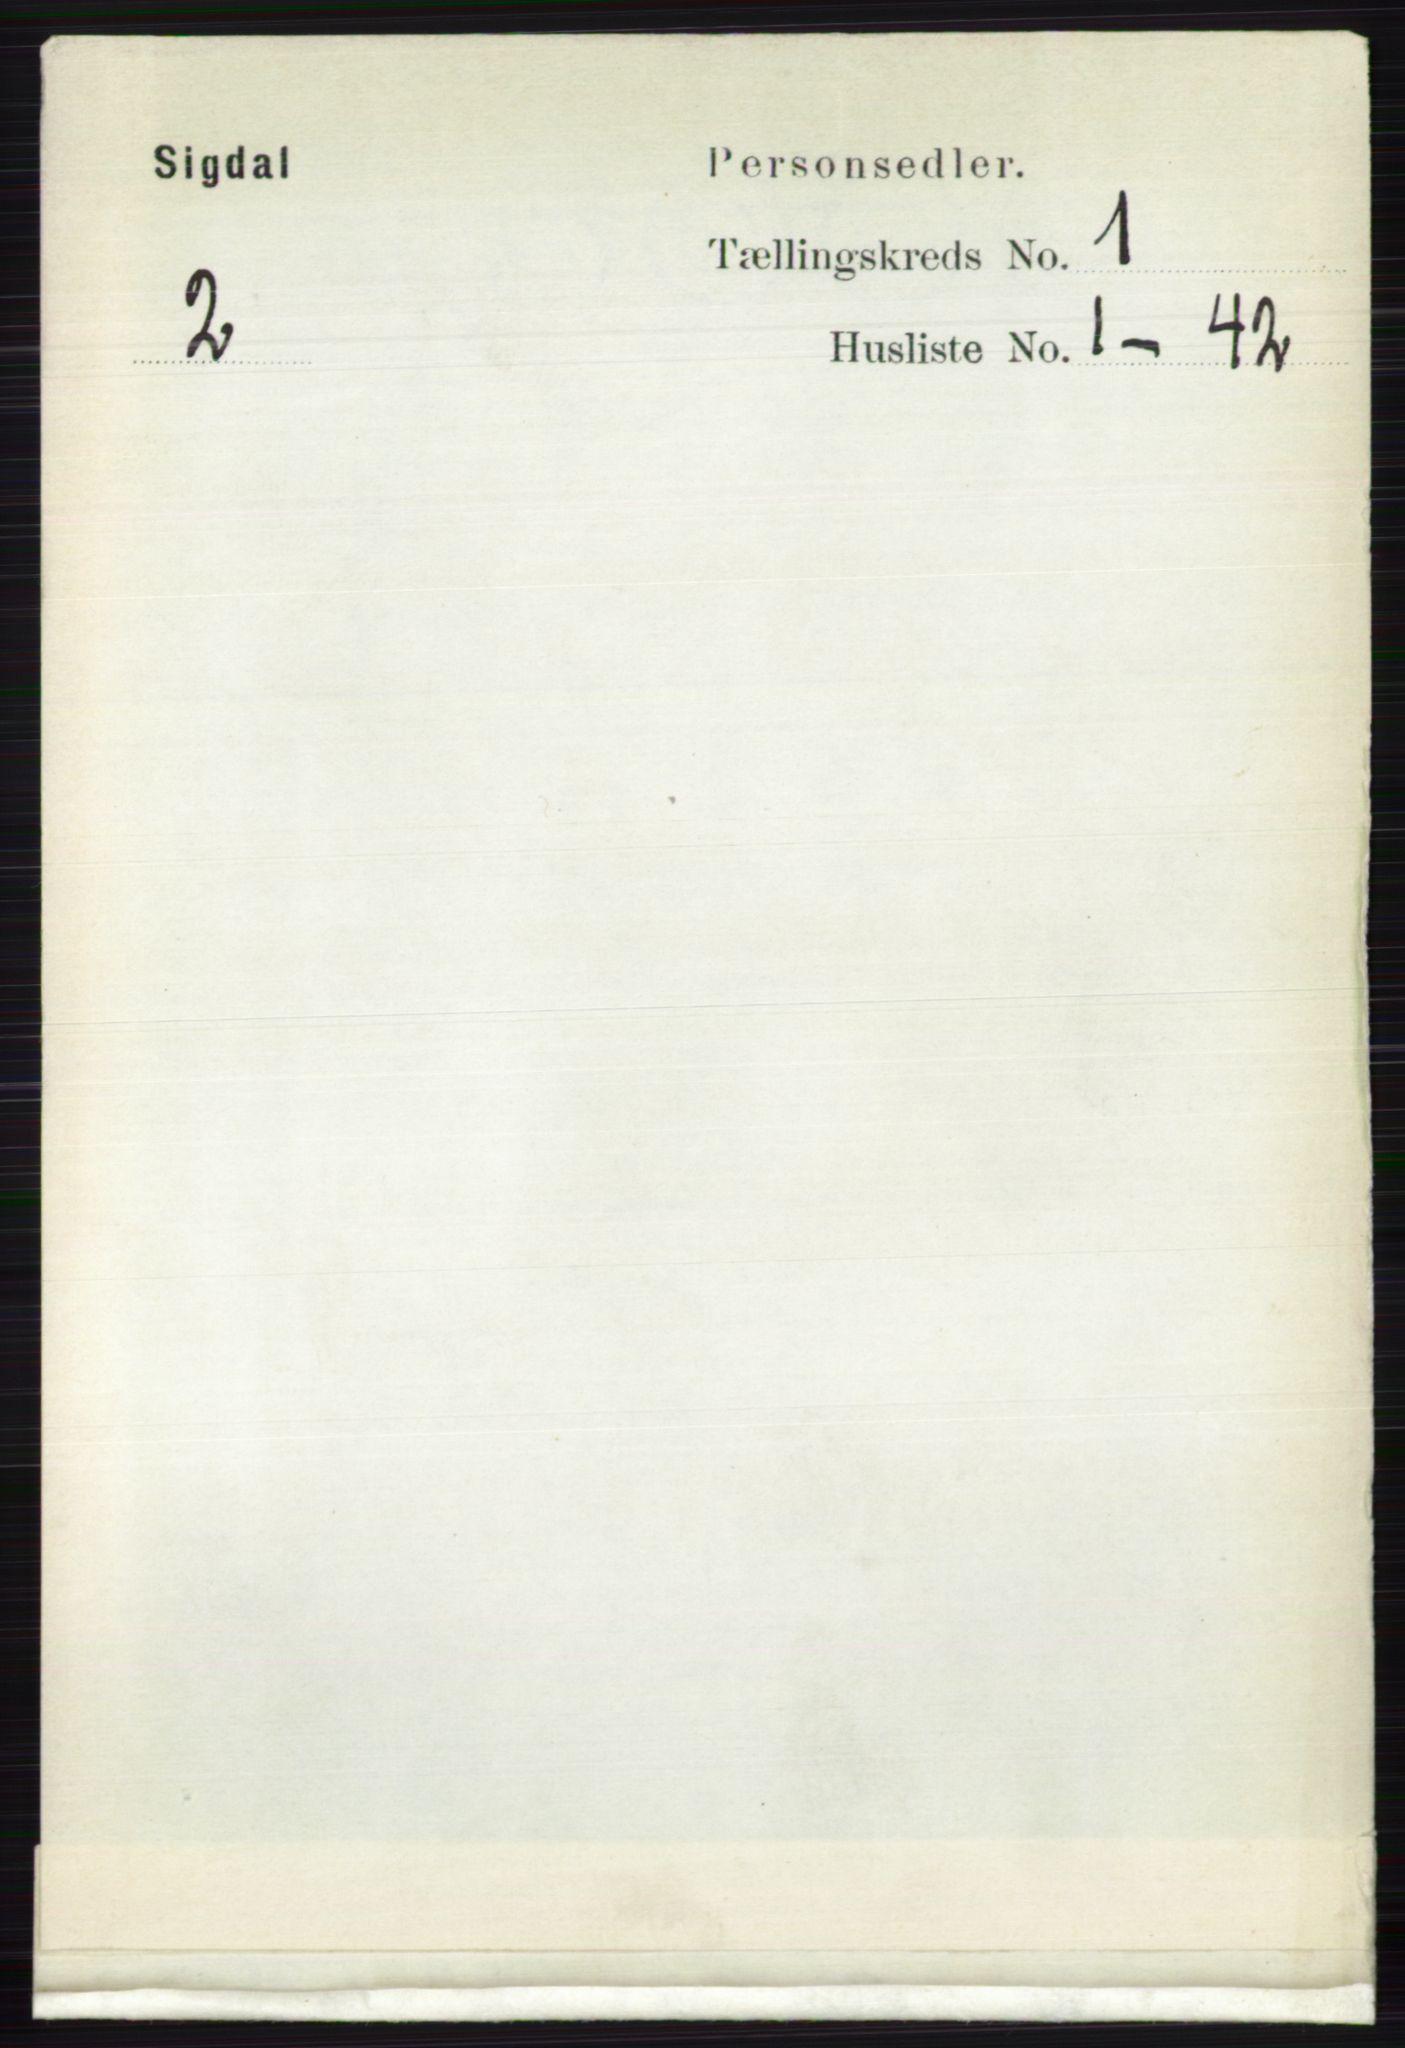 RA, Folketelling 1891 for 0621 Sigdal herred, 1891, s. 186